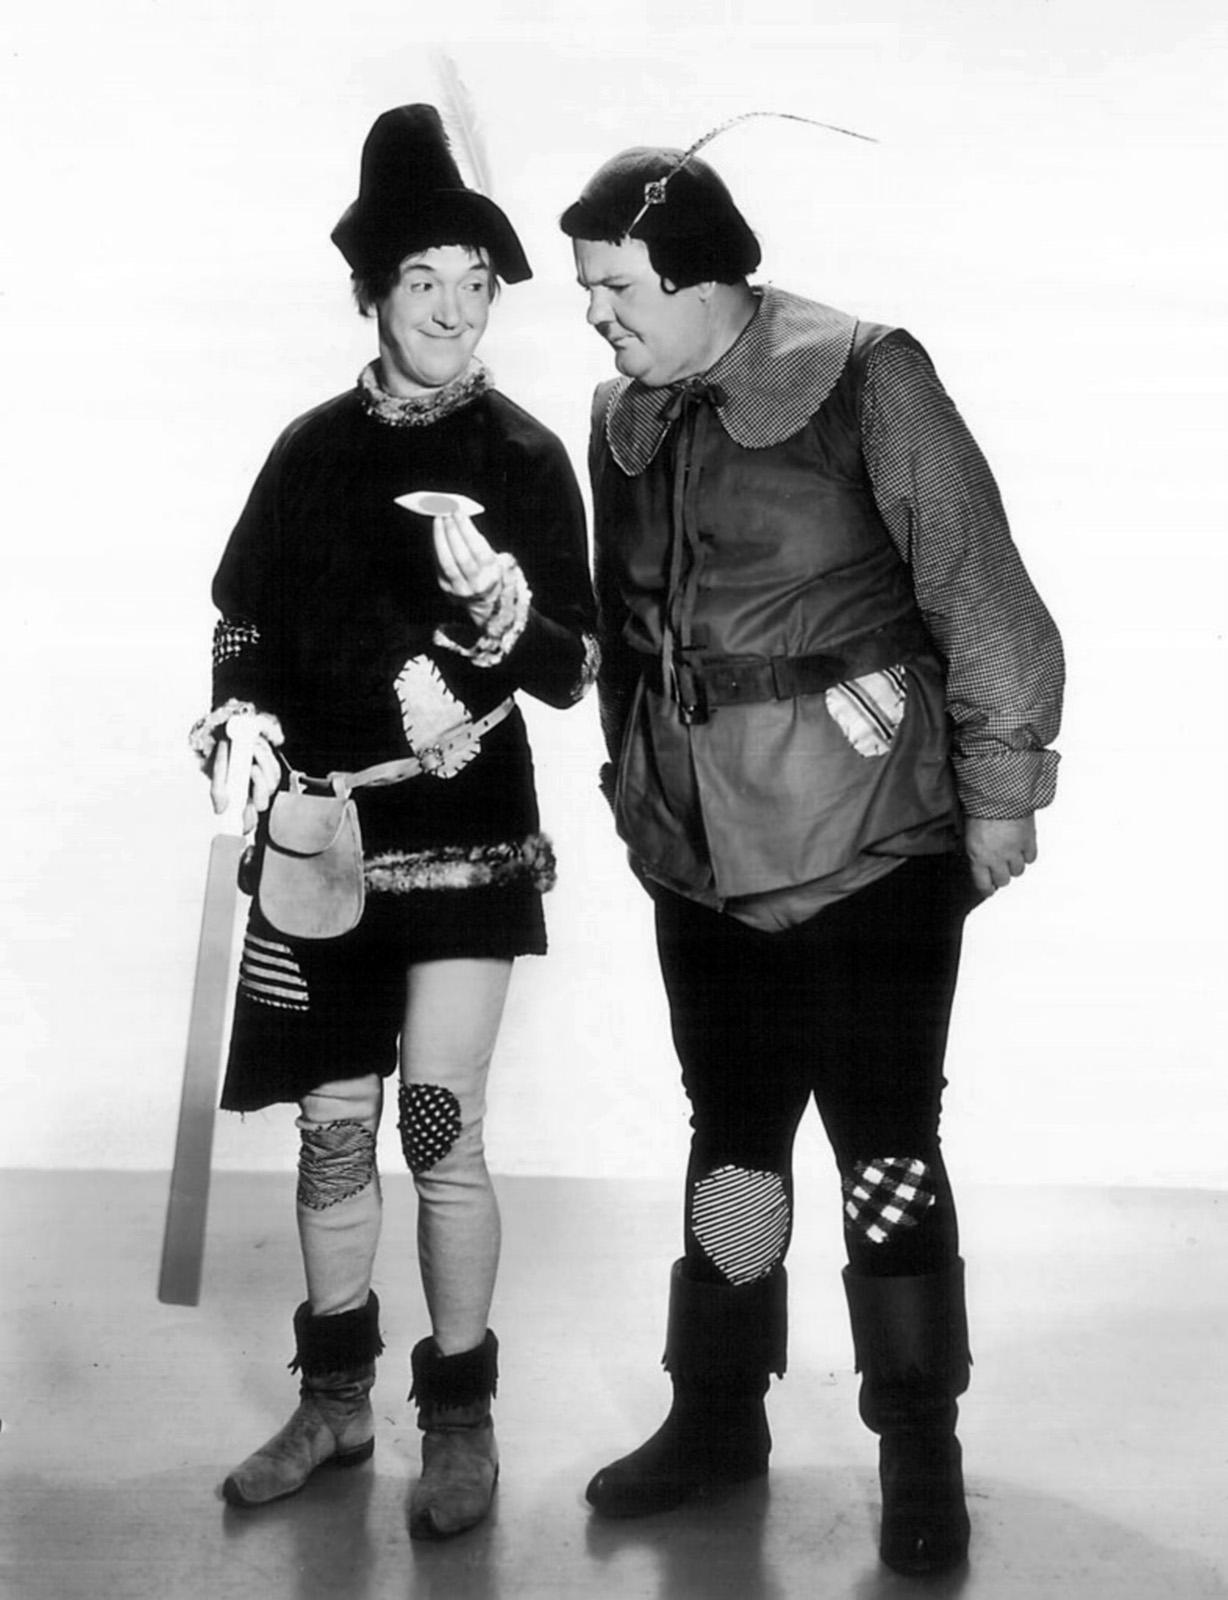 Annex - Laurel & Hardy (Babes in Toyland)_NRFPT_03.jpg (1228×1600)